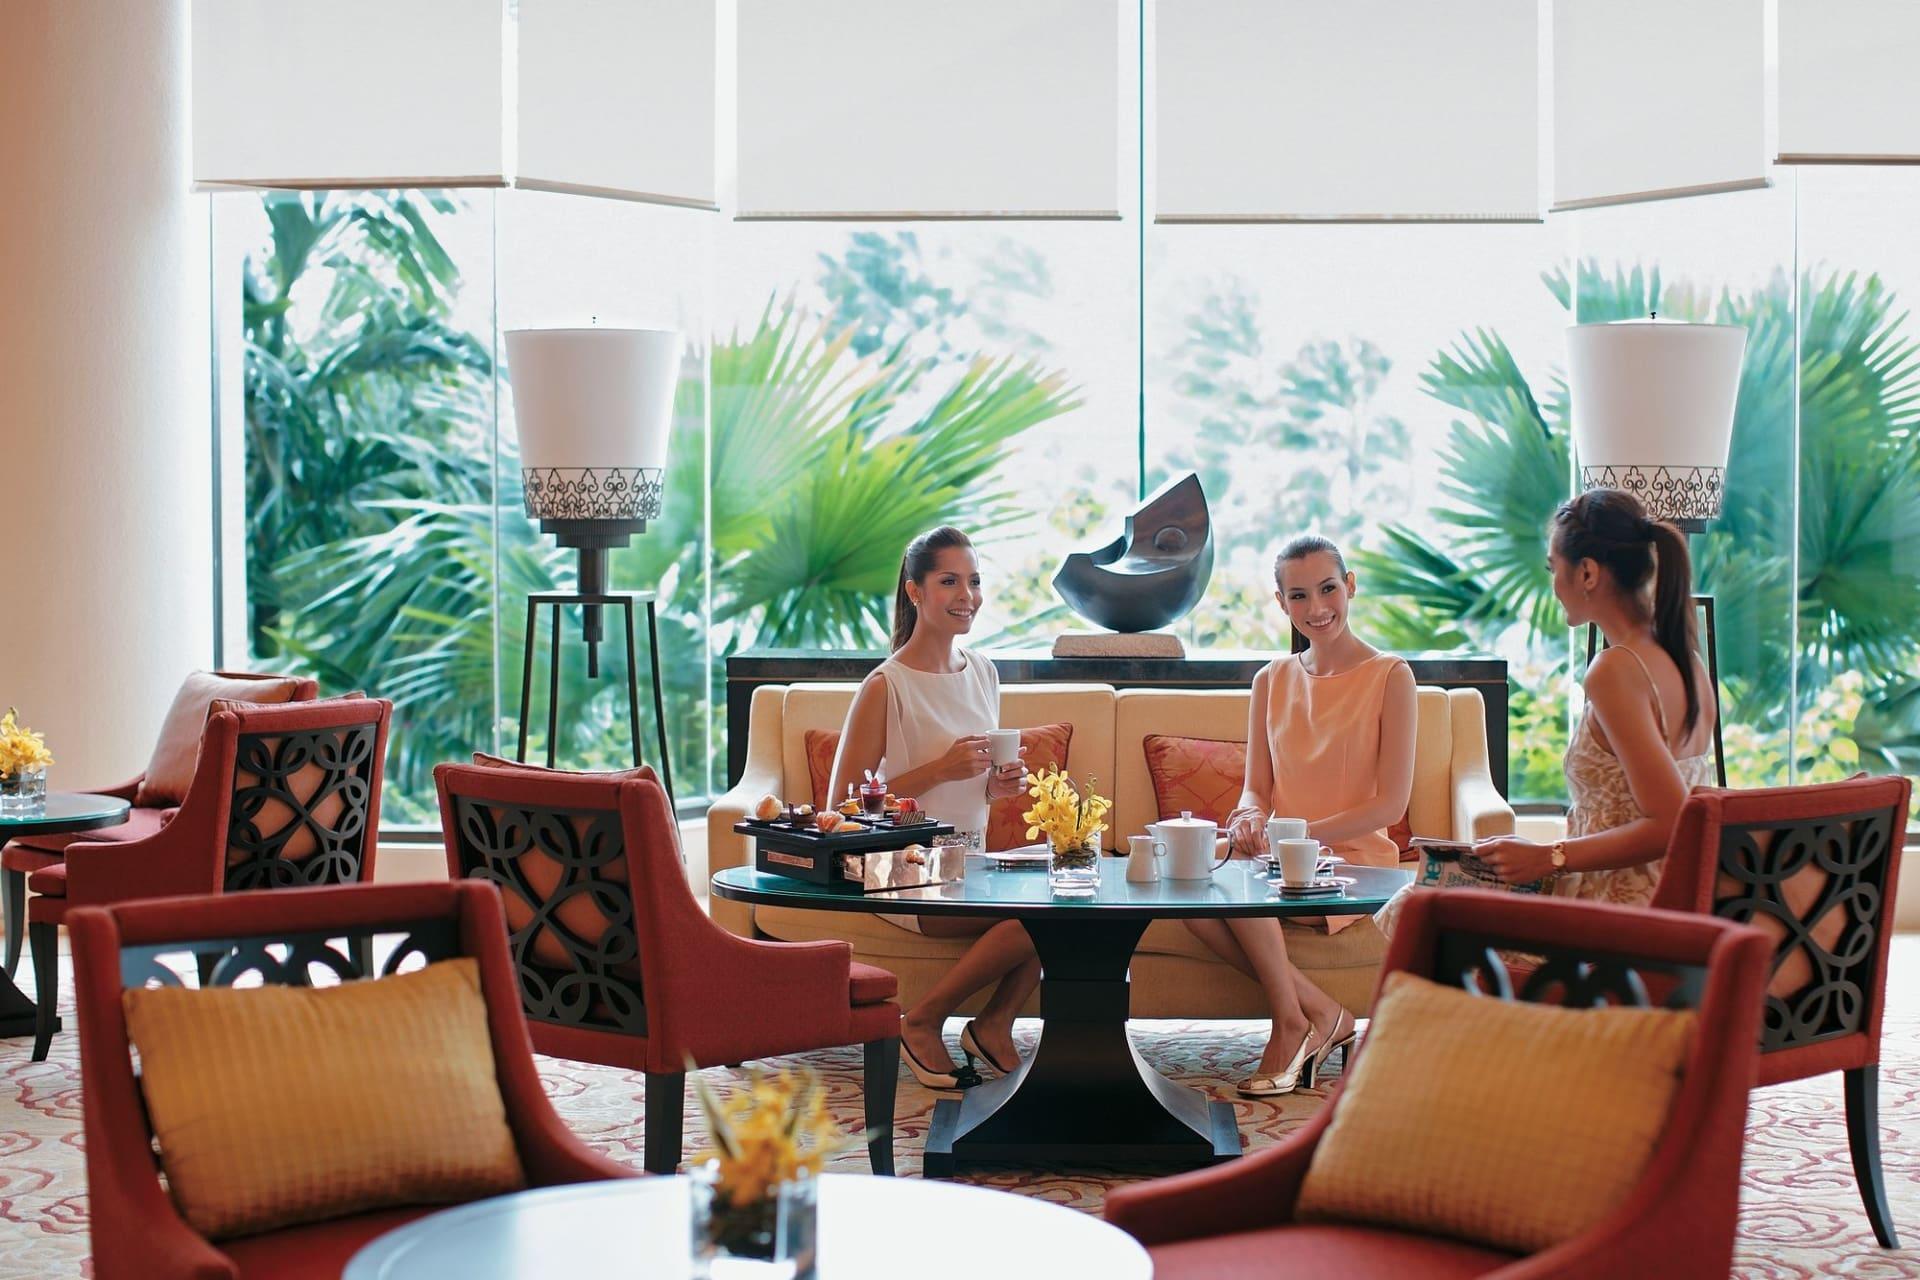 f&b: Lobby Lounge Afternoon Tea